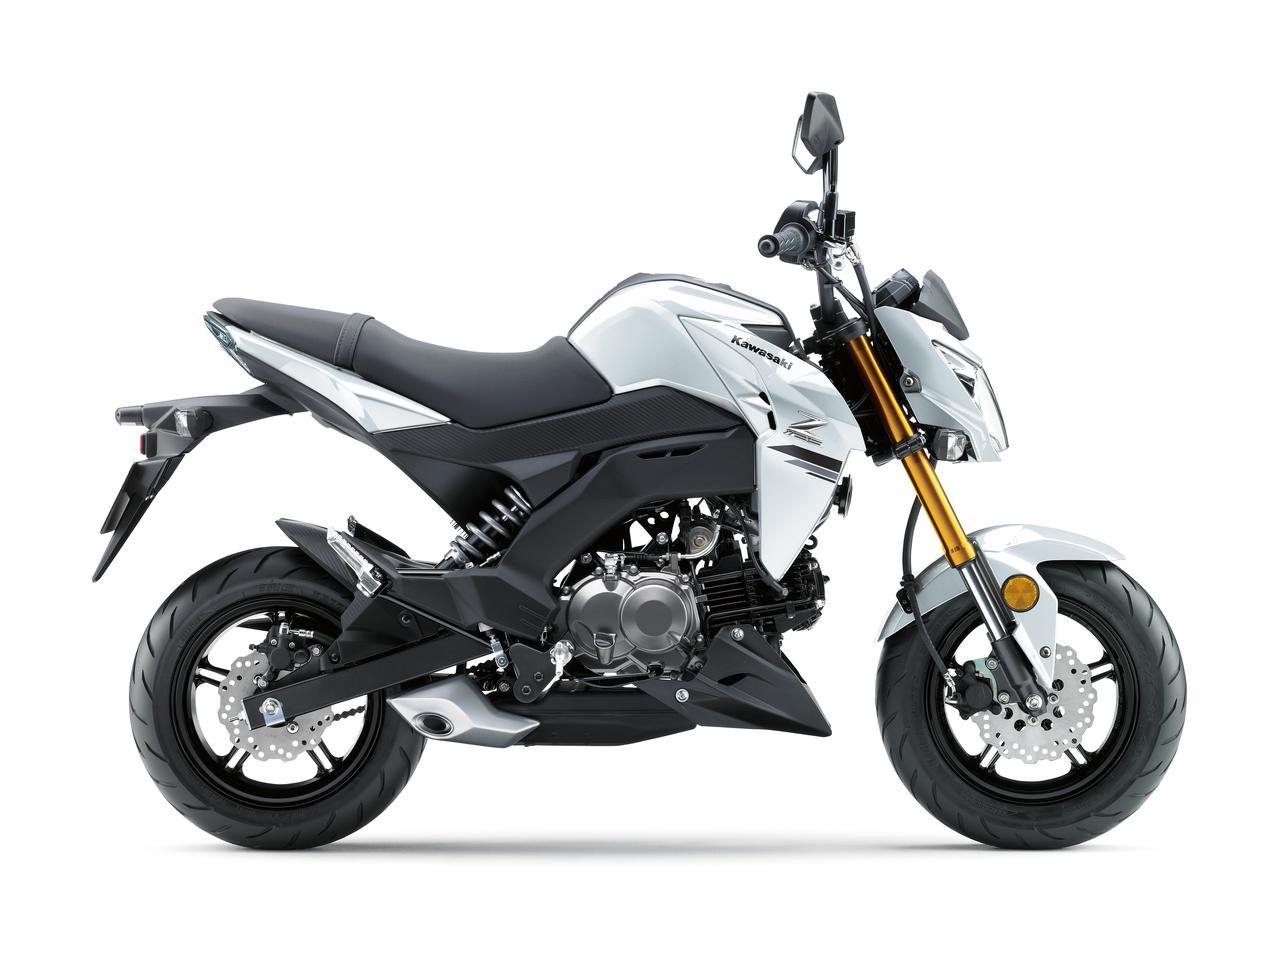 Images : 6番目の画像 - Z125 PROの写真を全て見る - LAWRENCE - Motorcycle x Cars + α = Your Life.